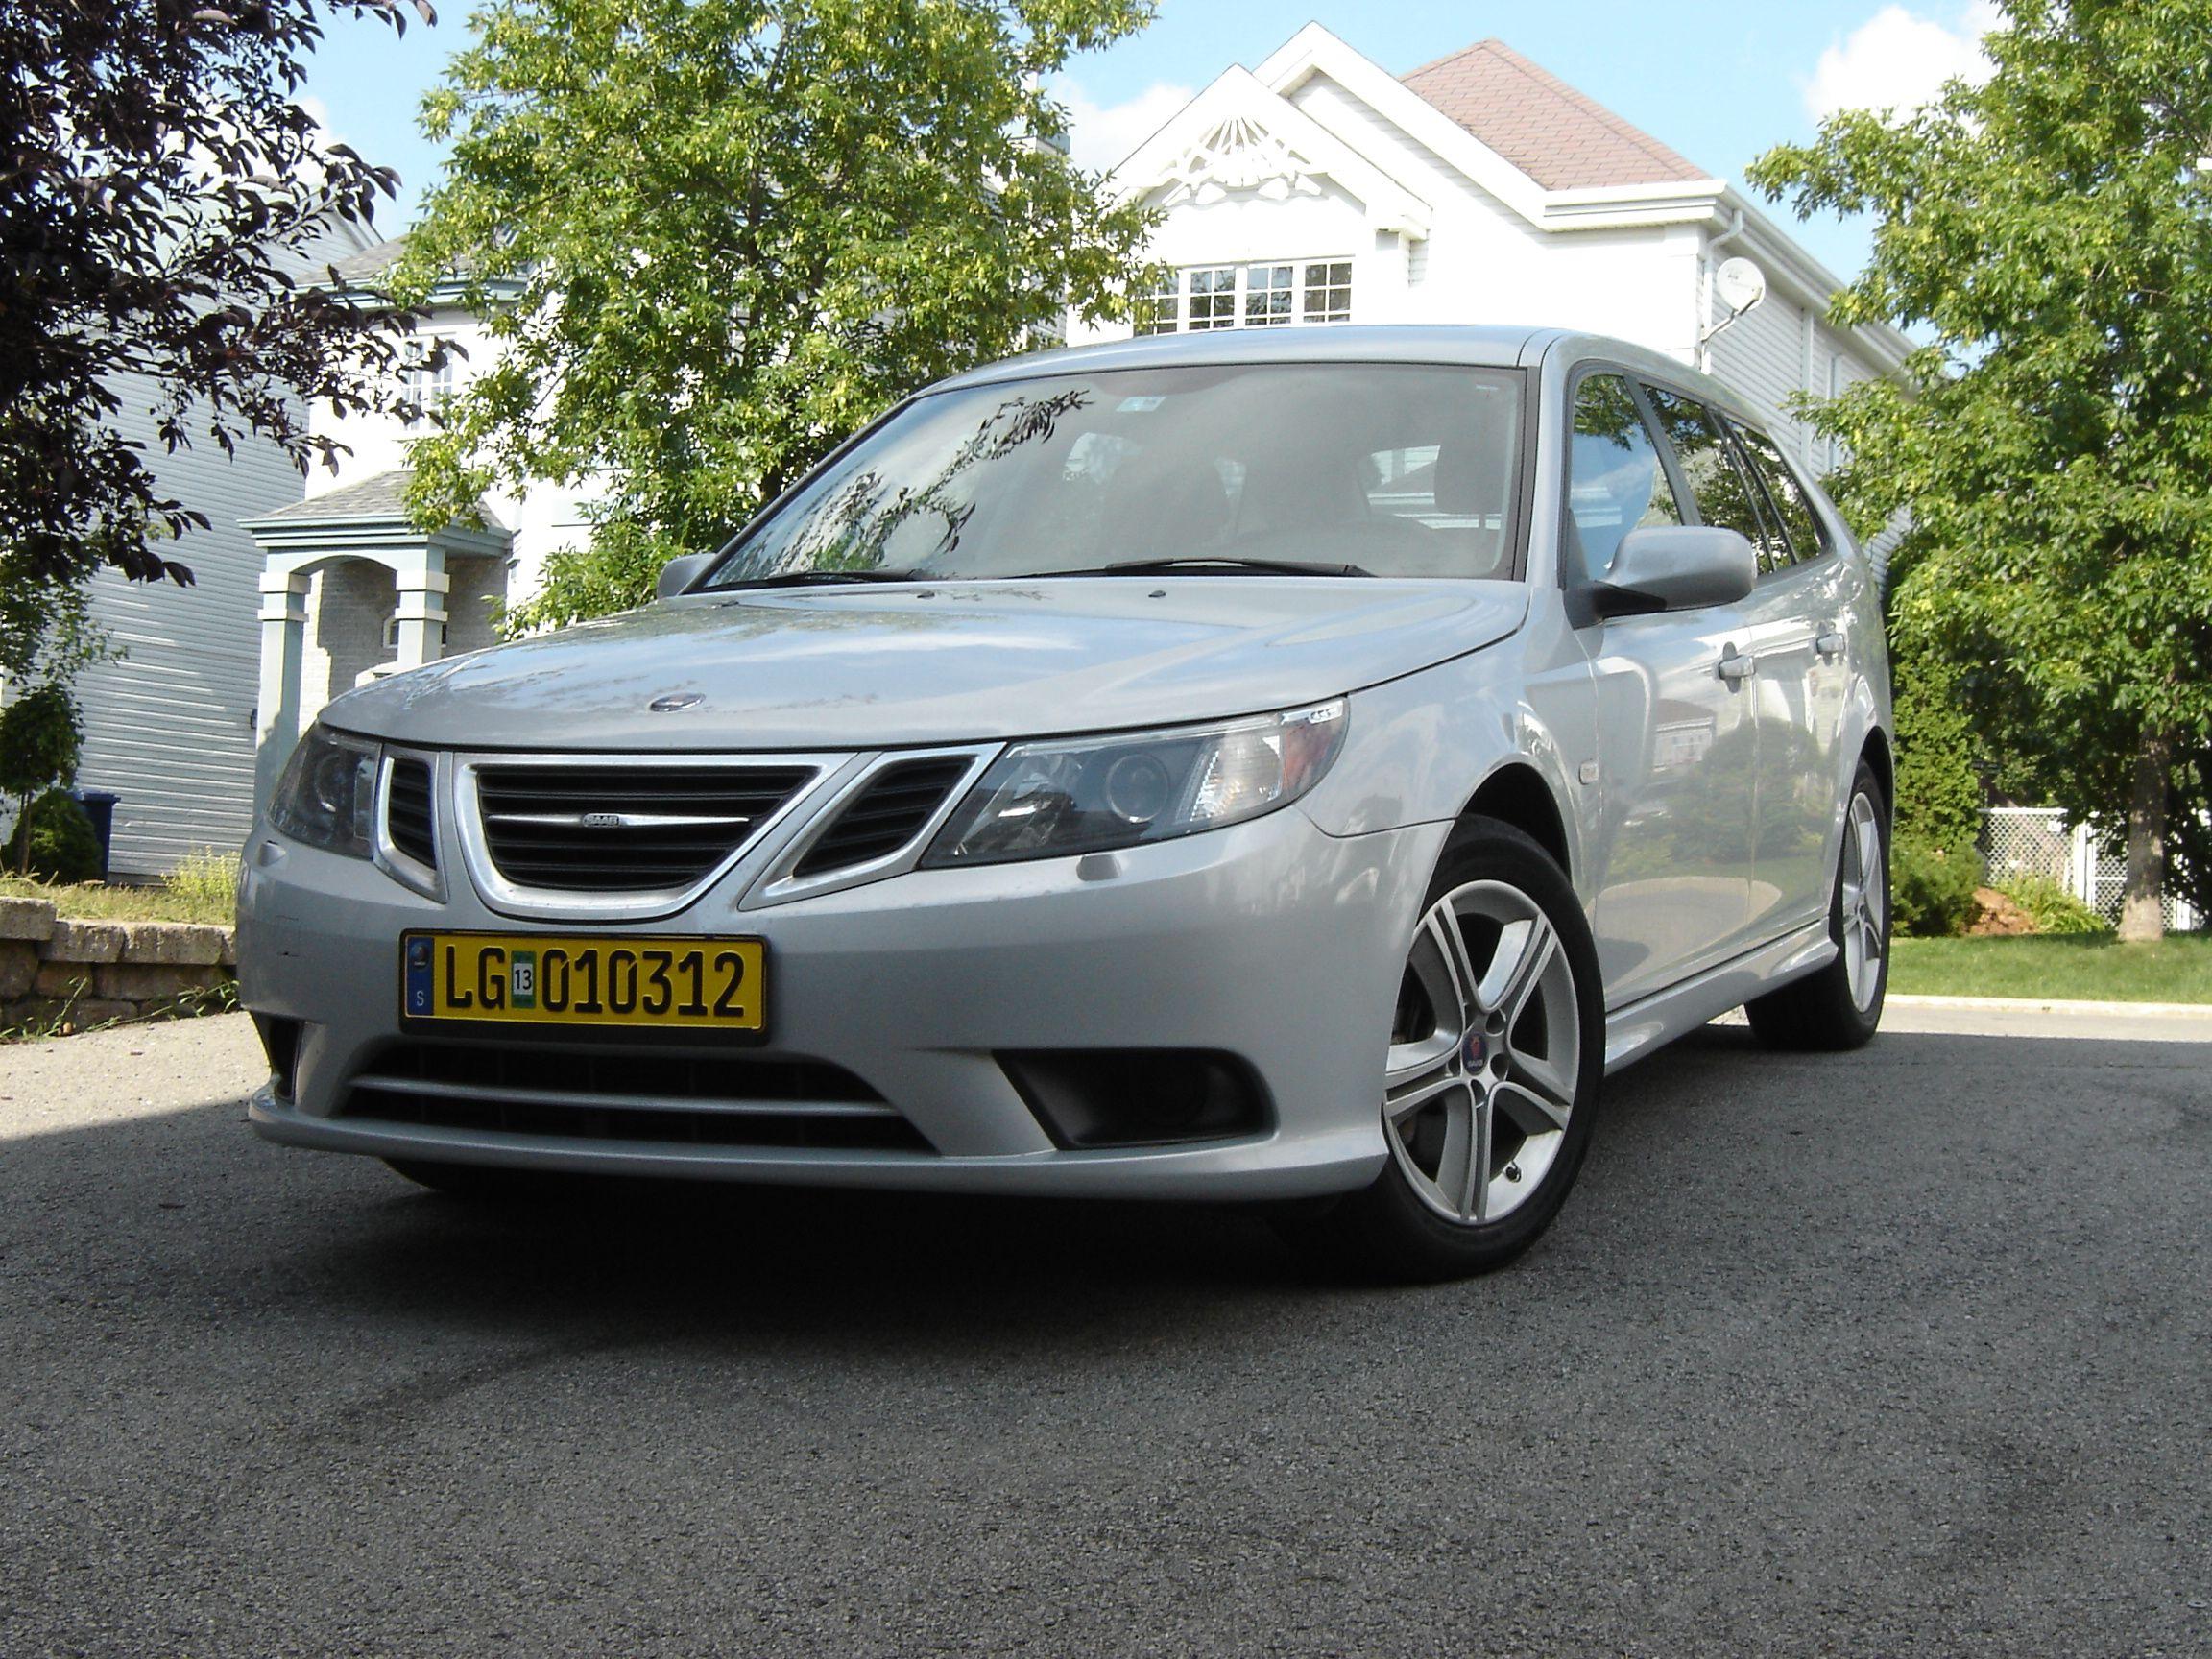 Saab Euro Style Plate Cars With Custom European License Plates